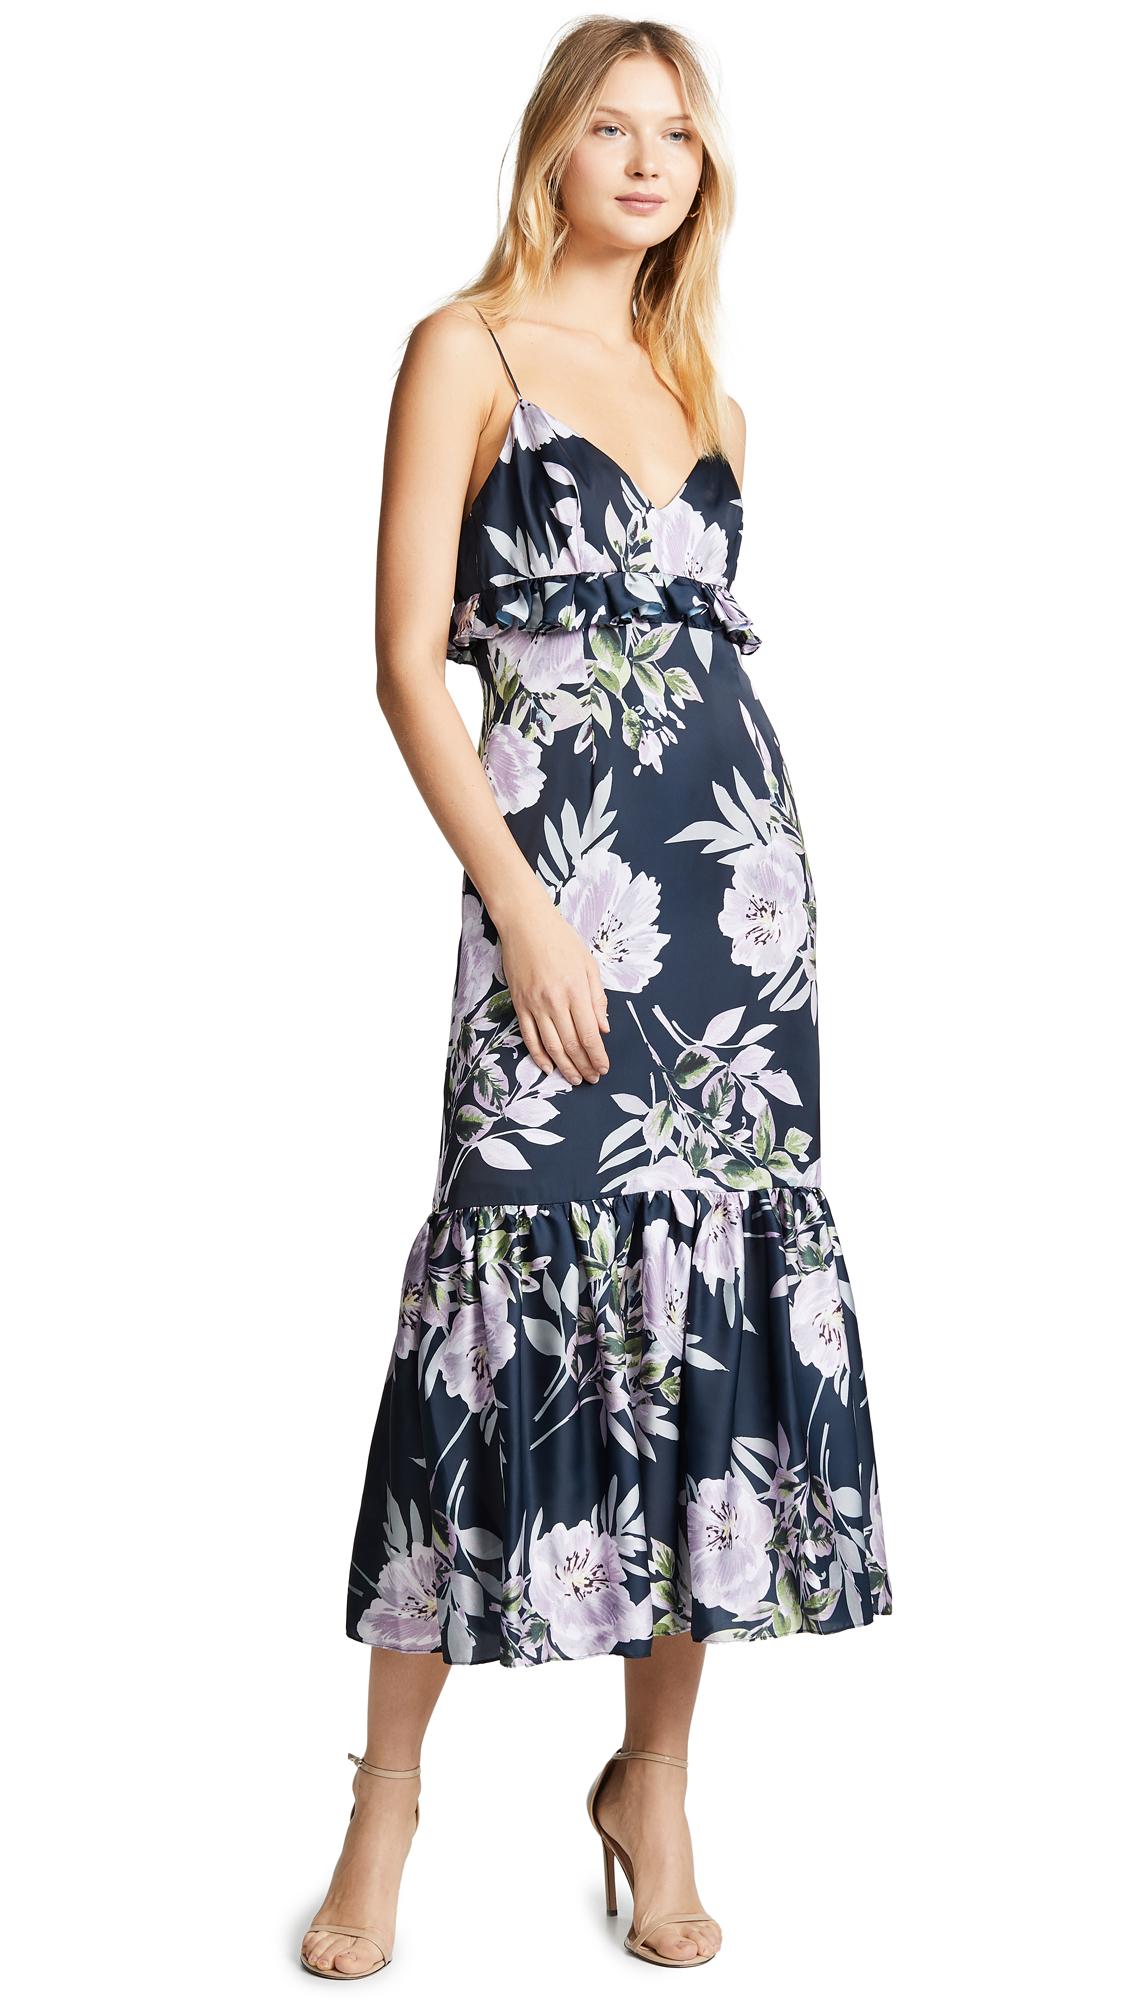 Jill Jill Stuart Ruffle Floral Gown - Floral